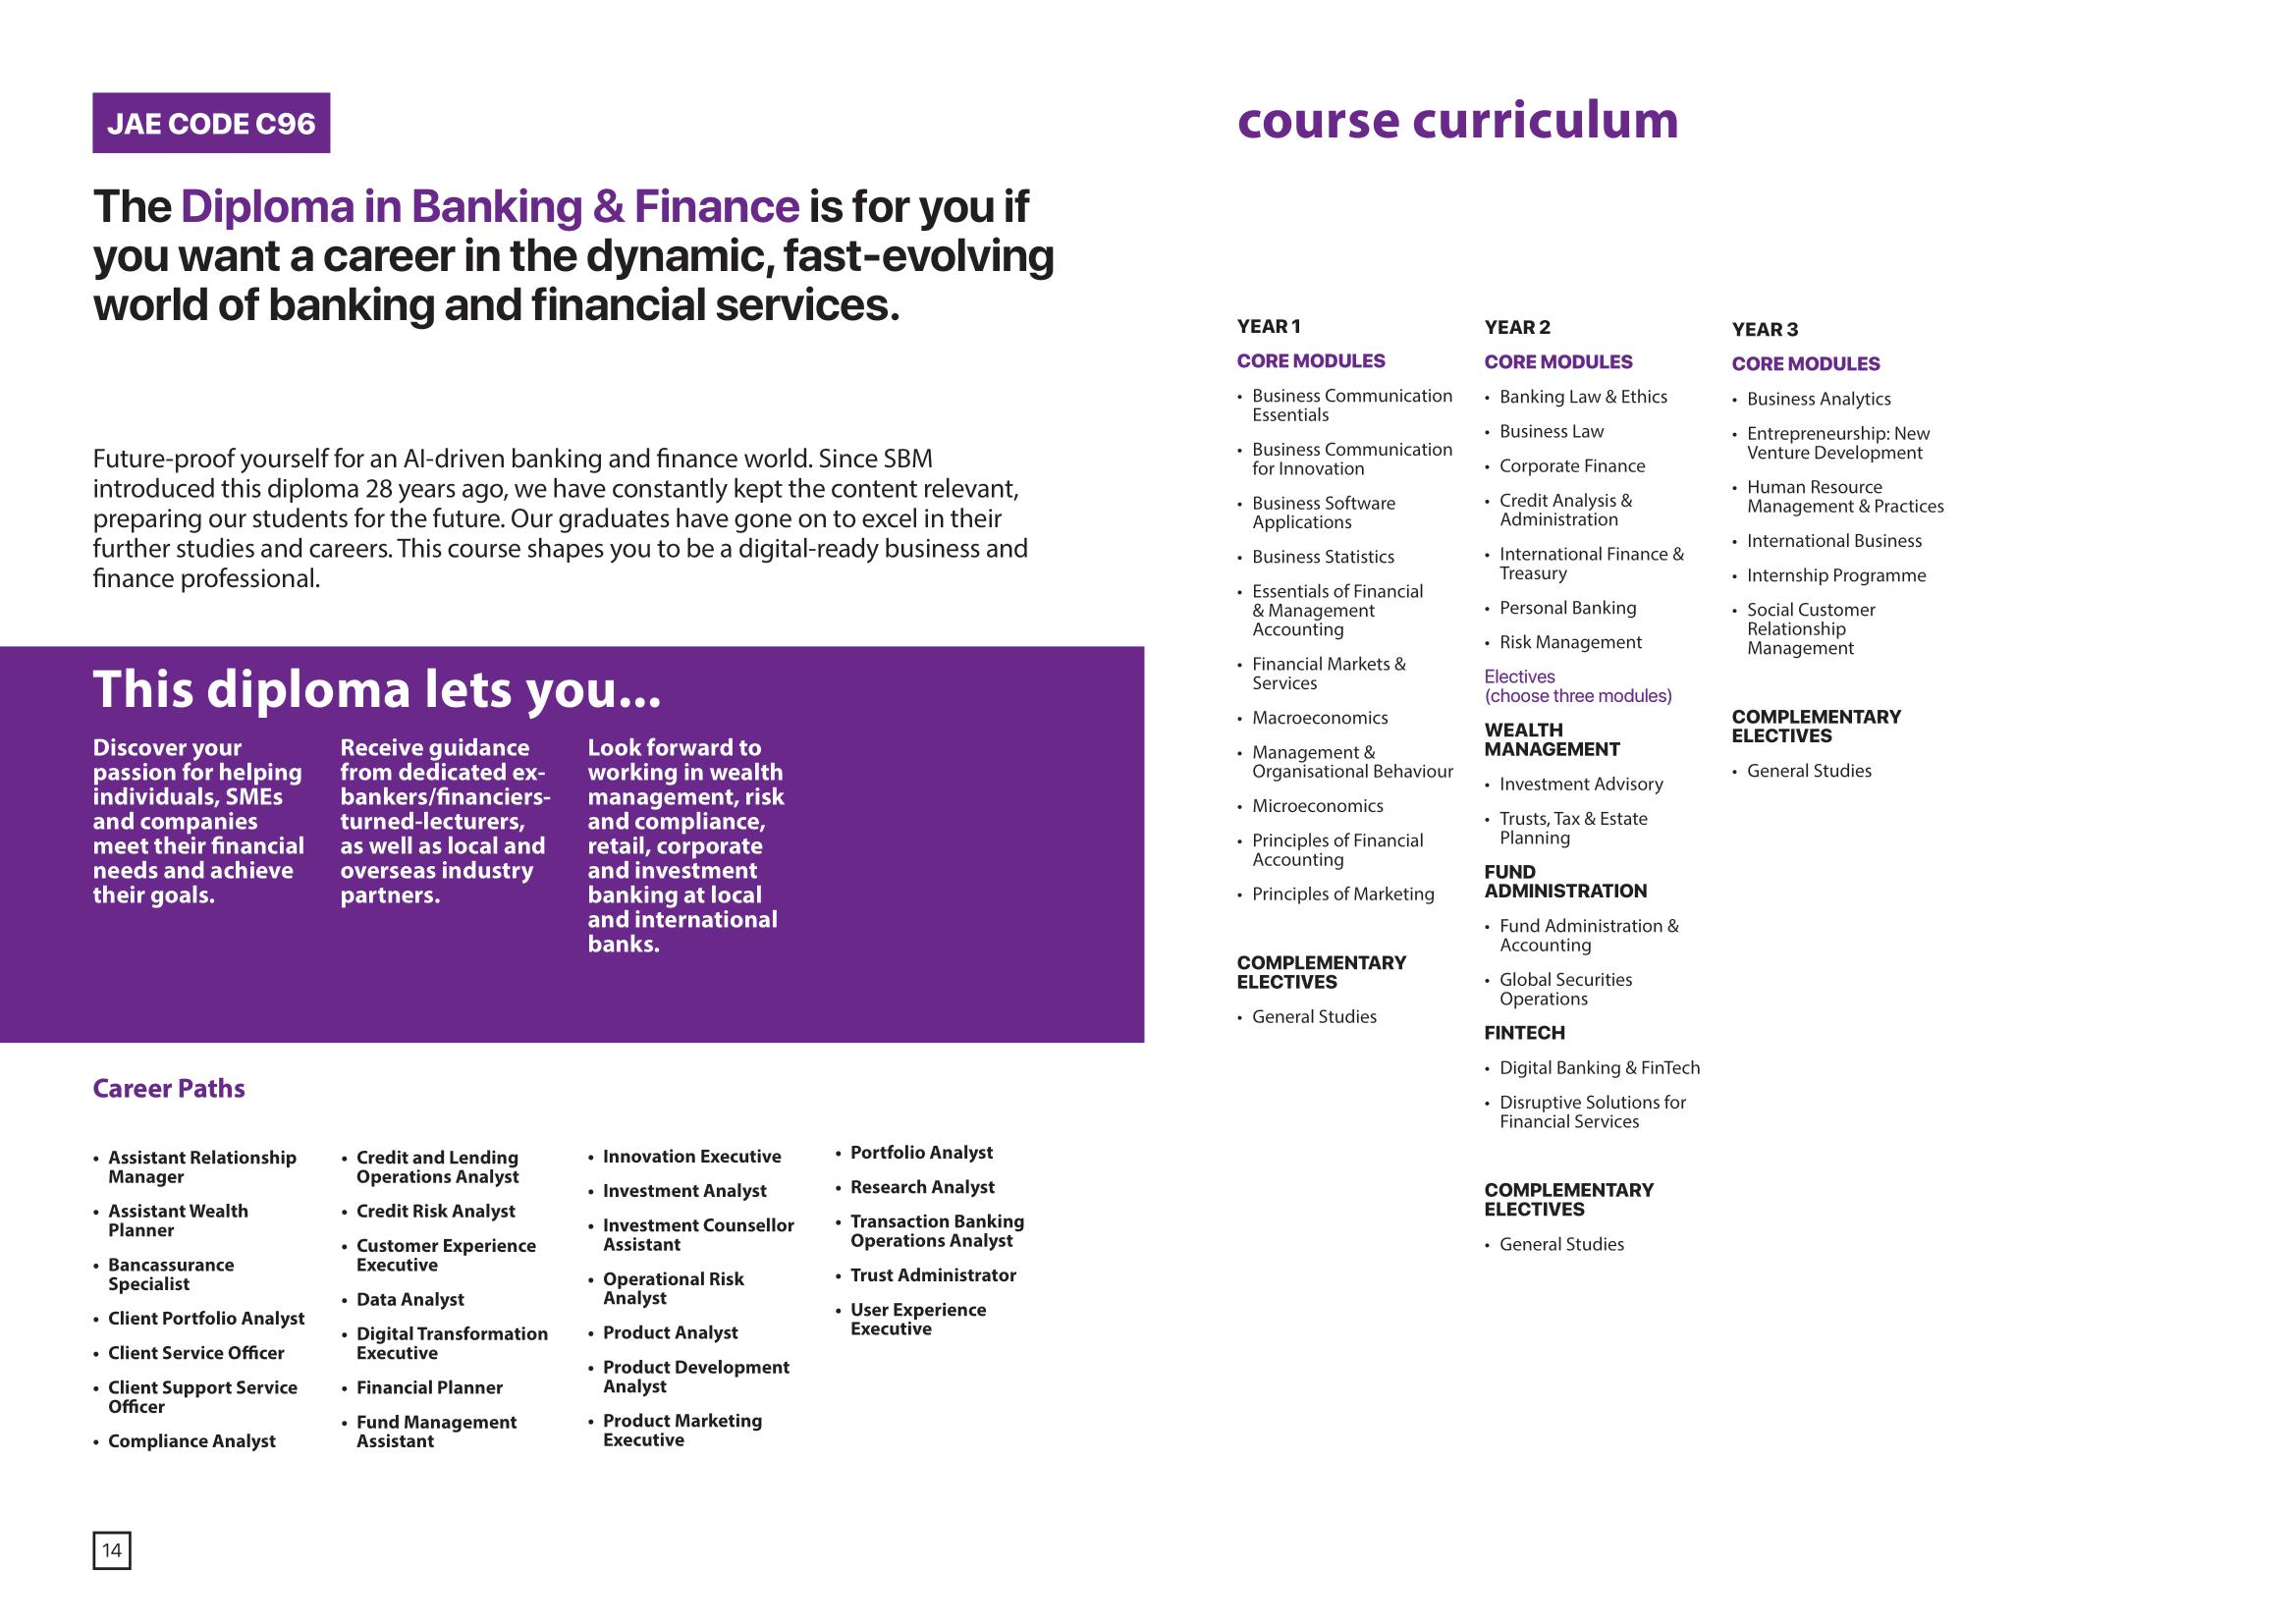 School of Business Management 2020-09